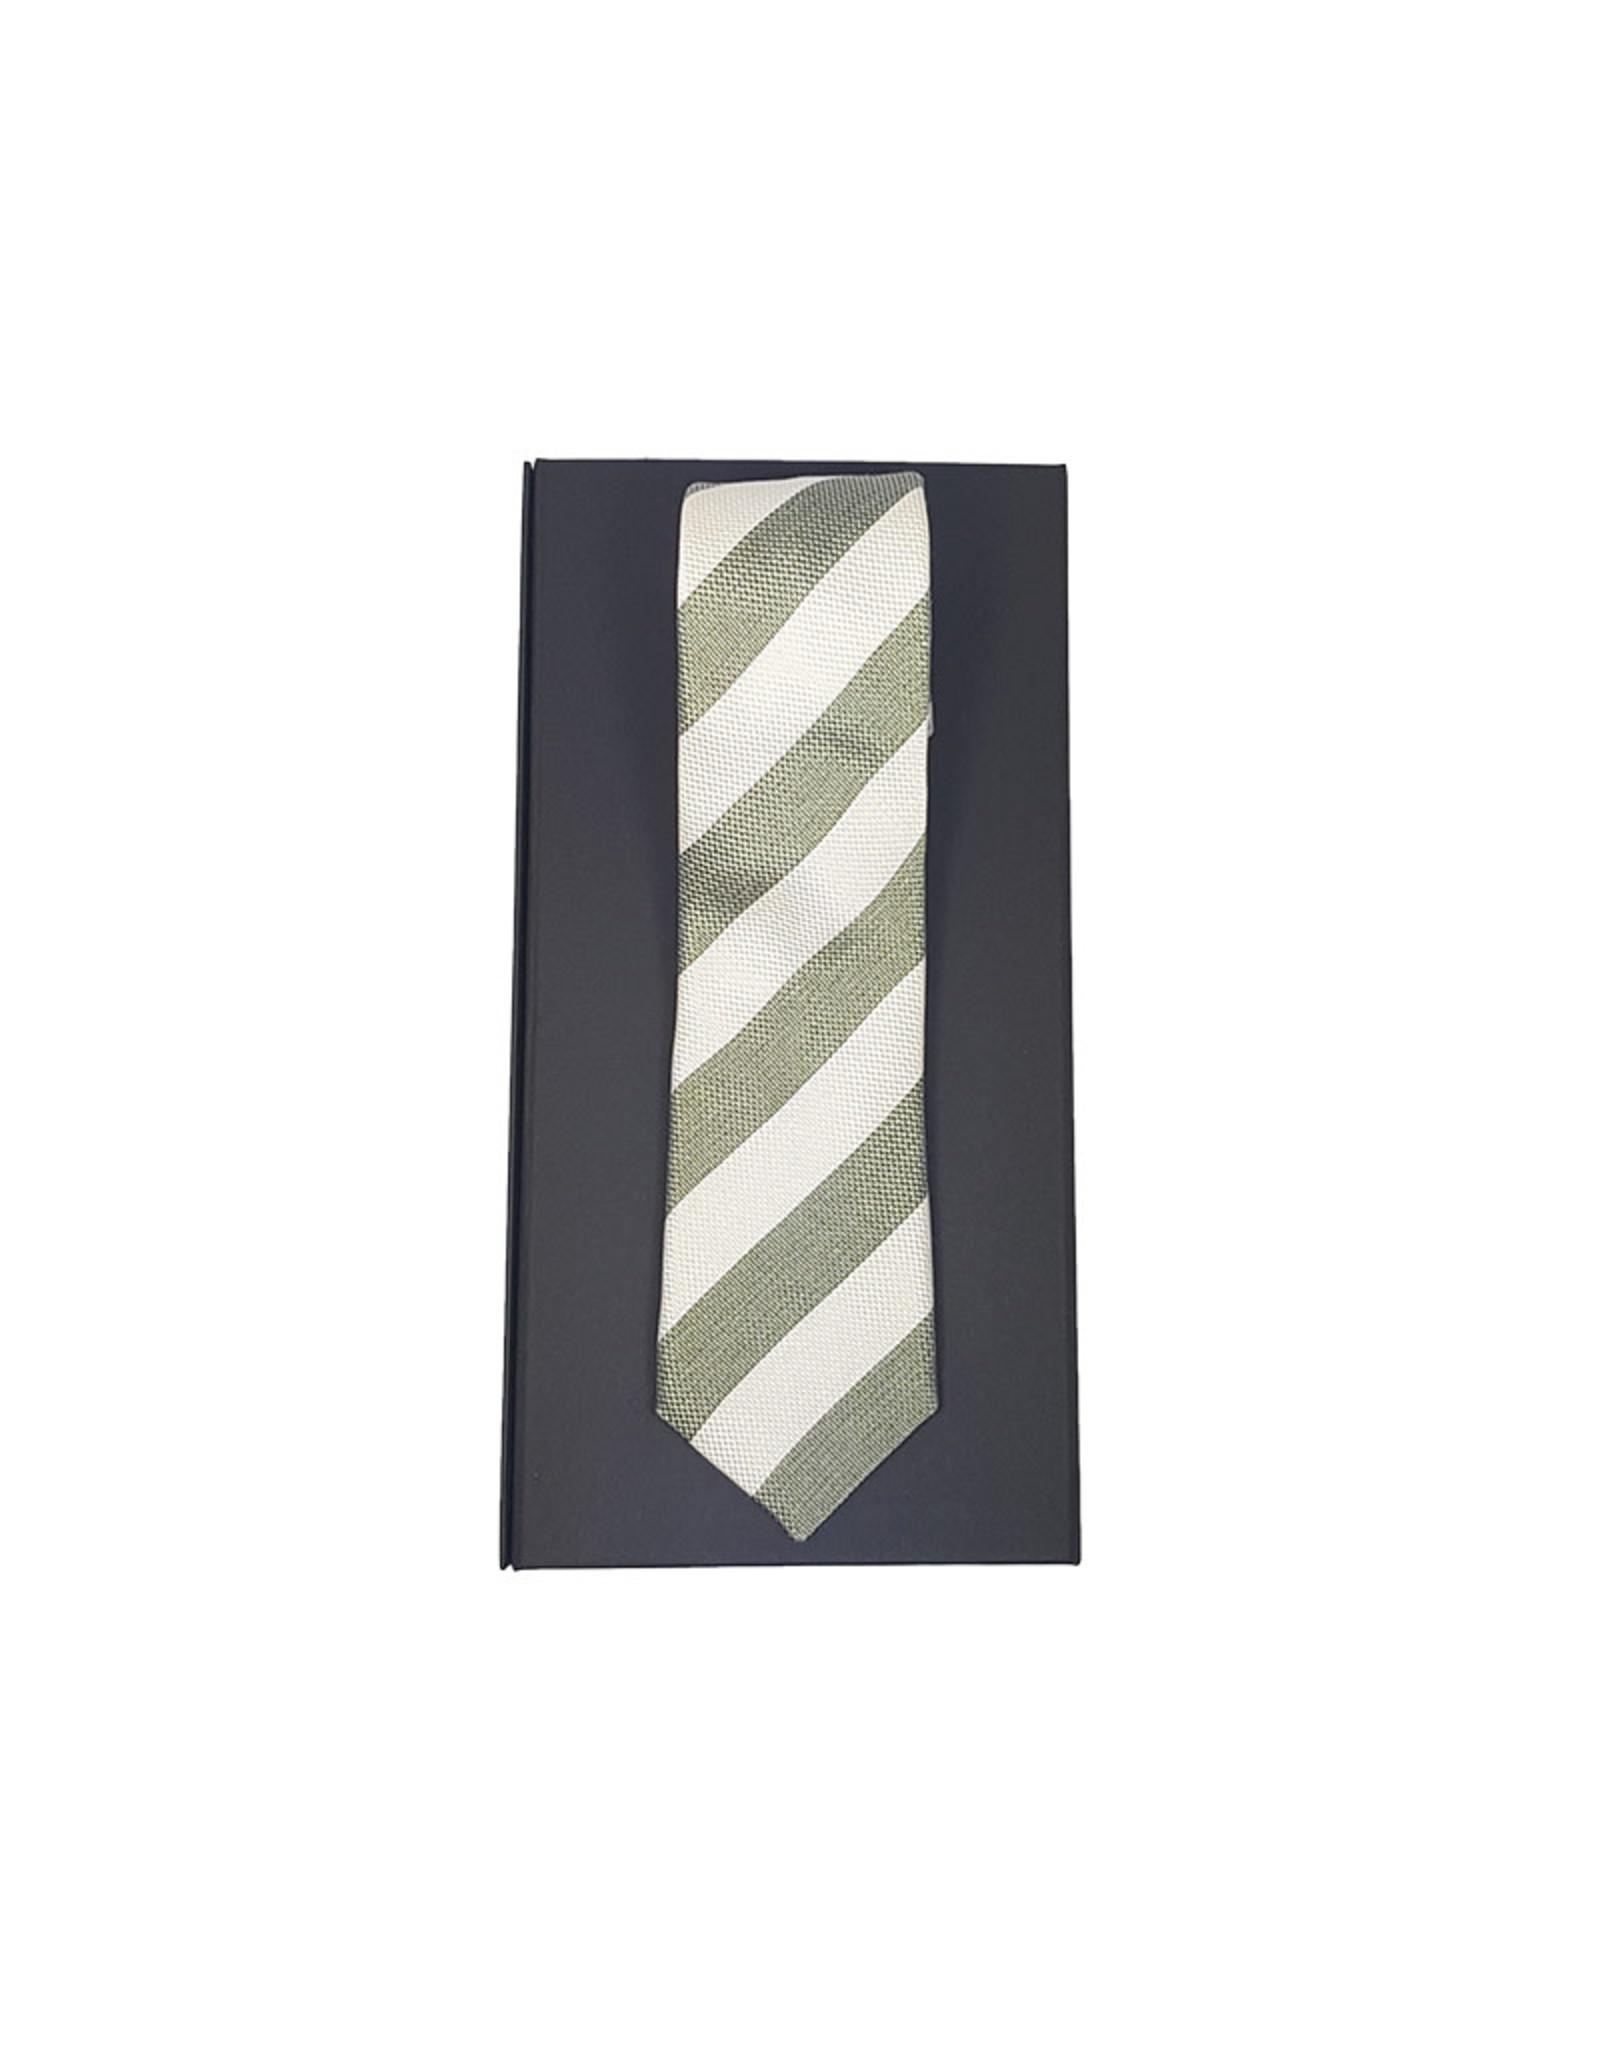 Hemley Sandmore's das groen gestreept 01297226